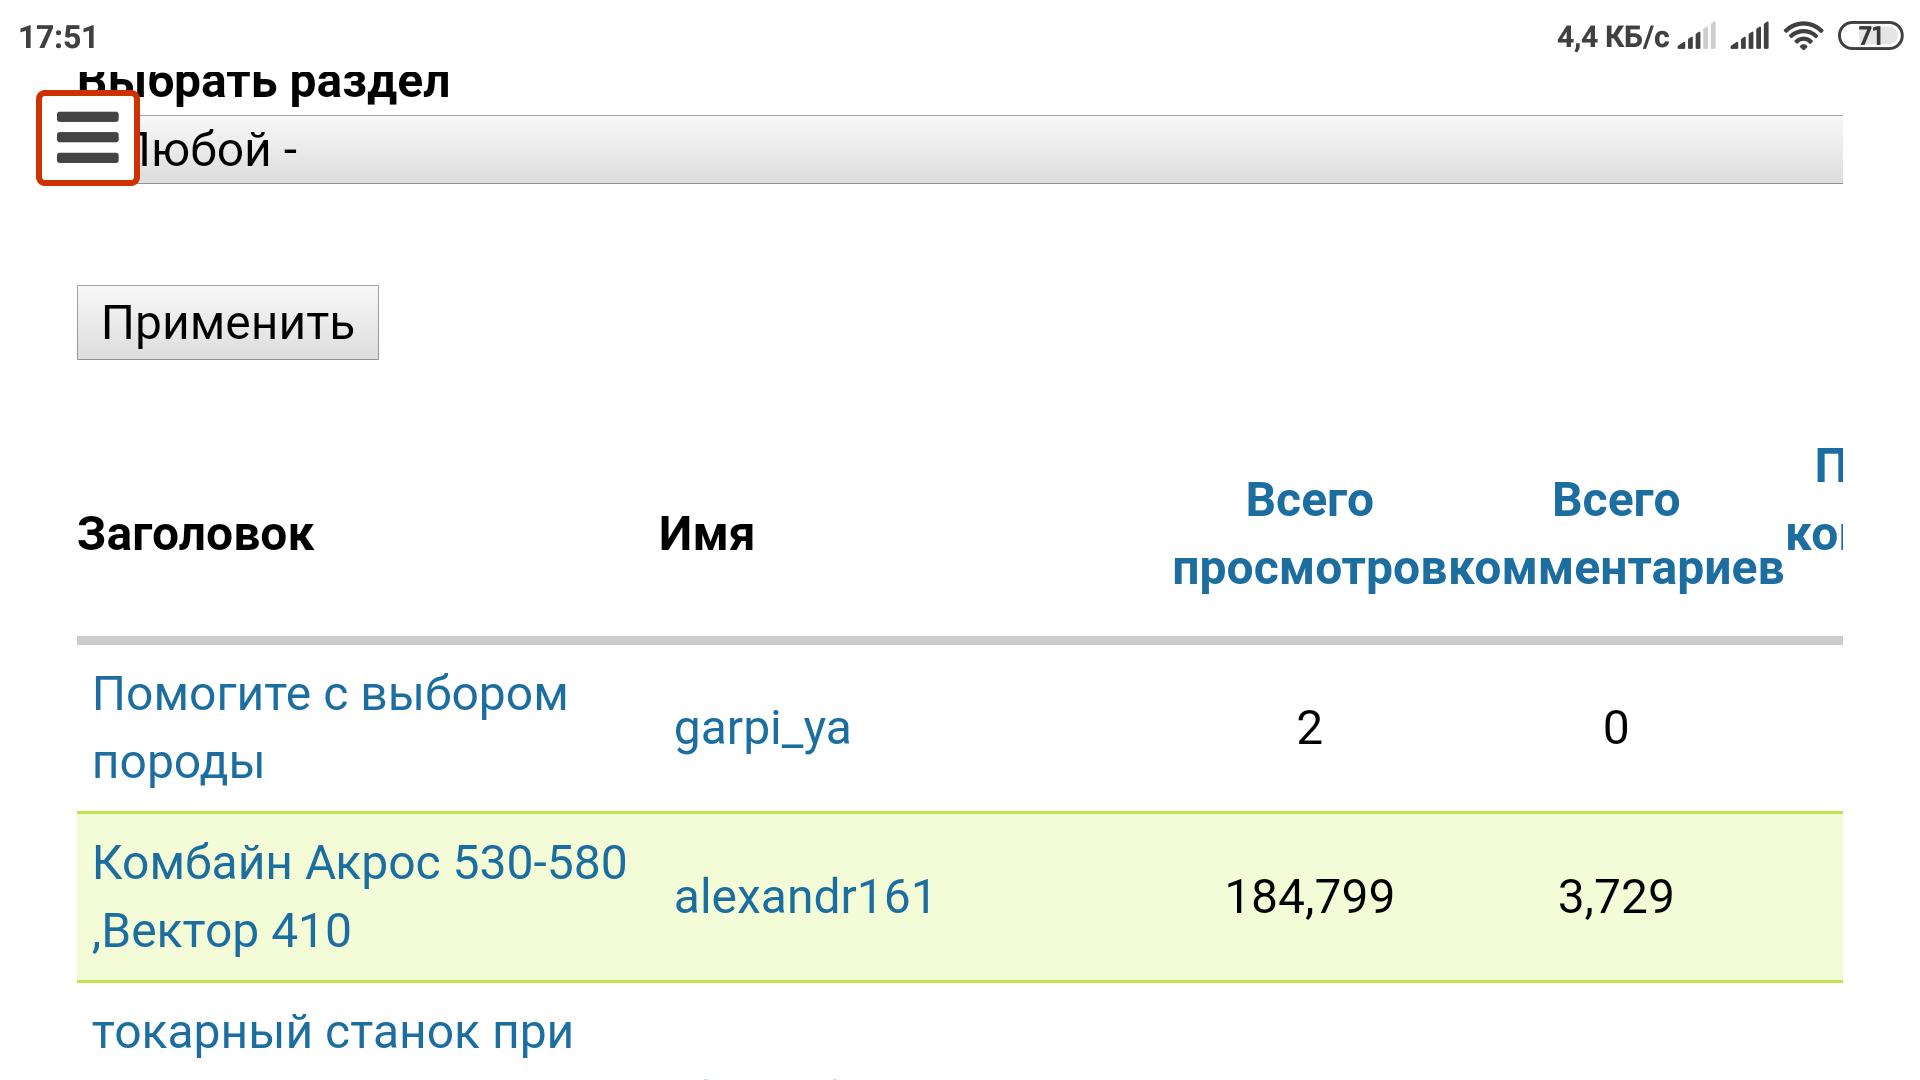 screenshot2019-04-01-17-51-31-973comandroidchrome.png